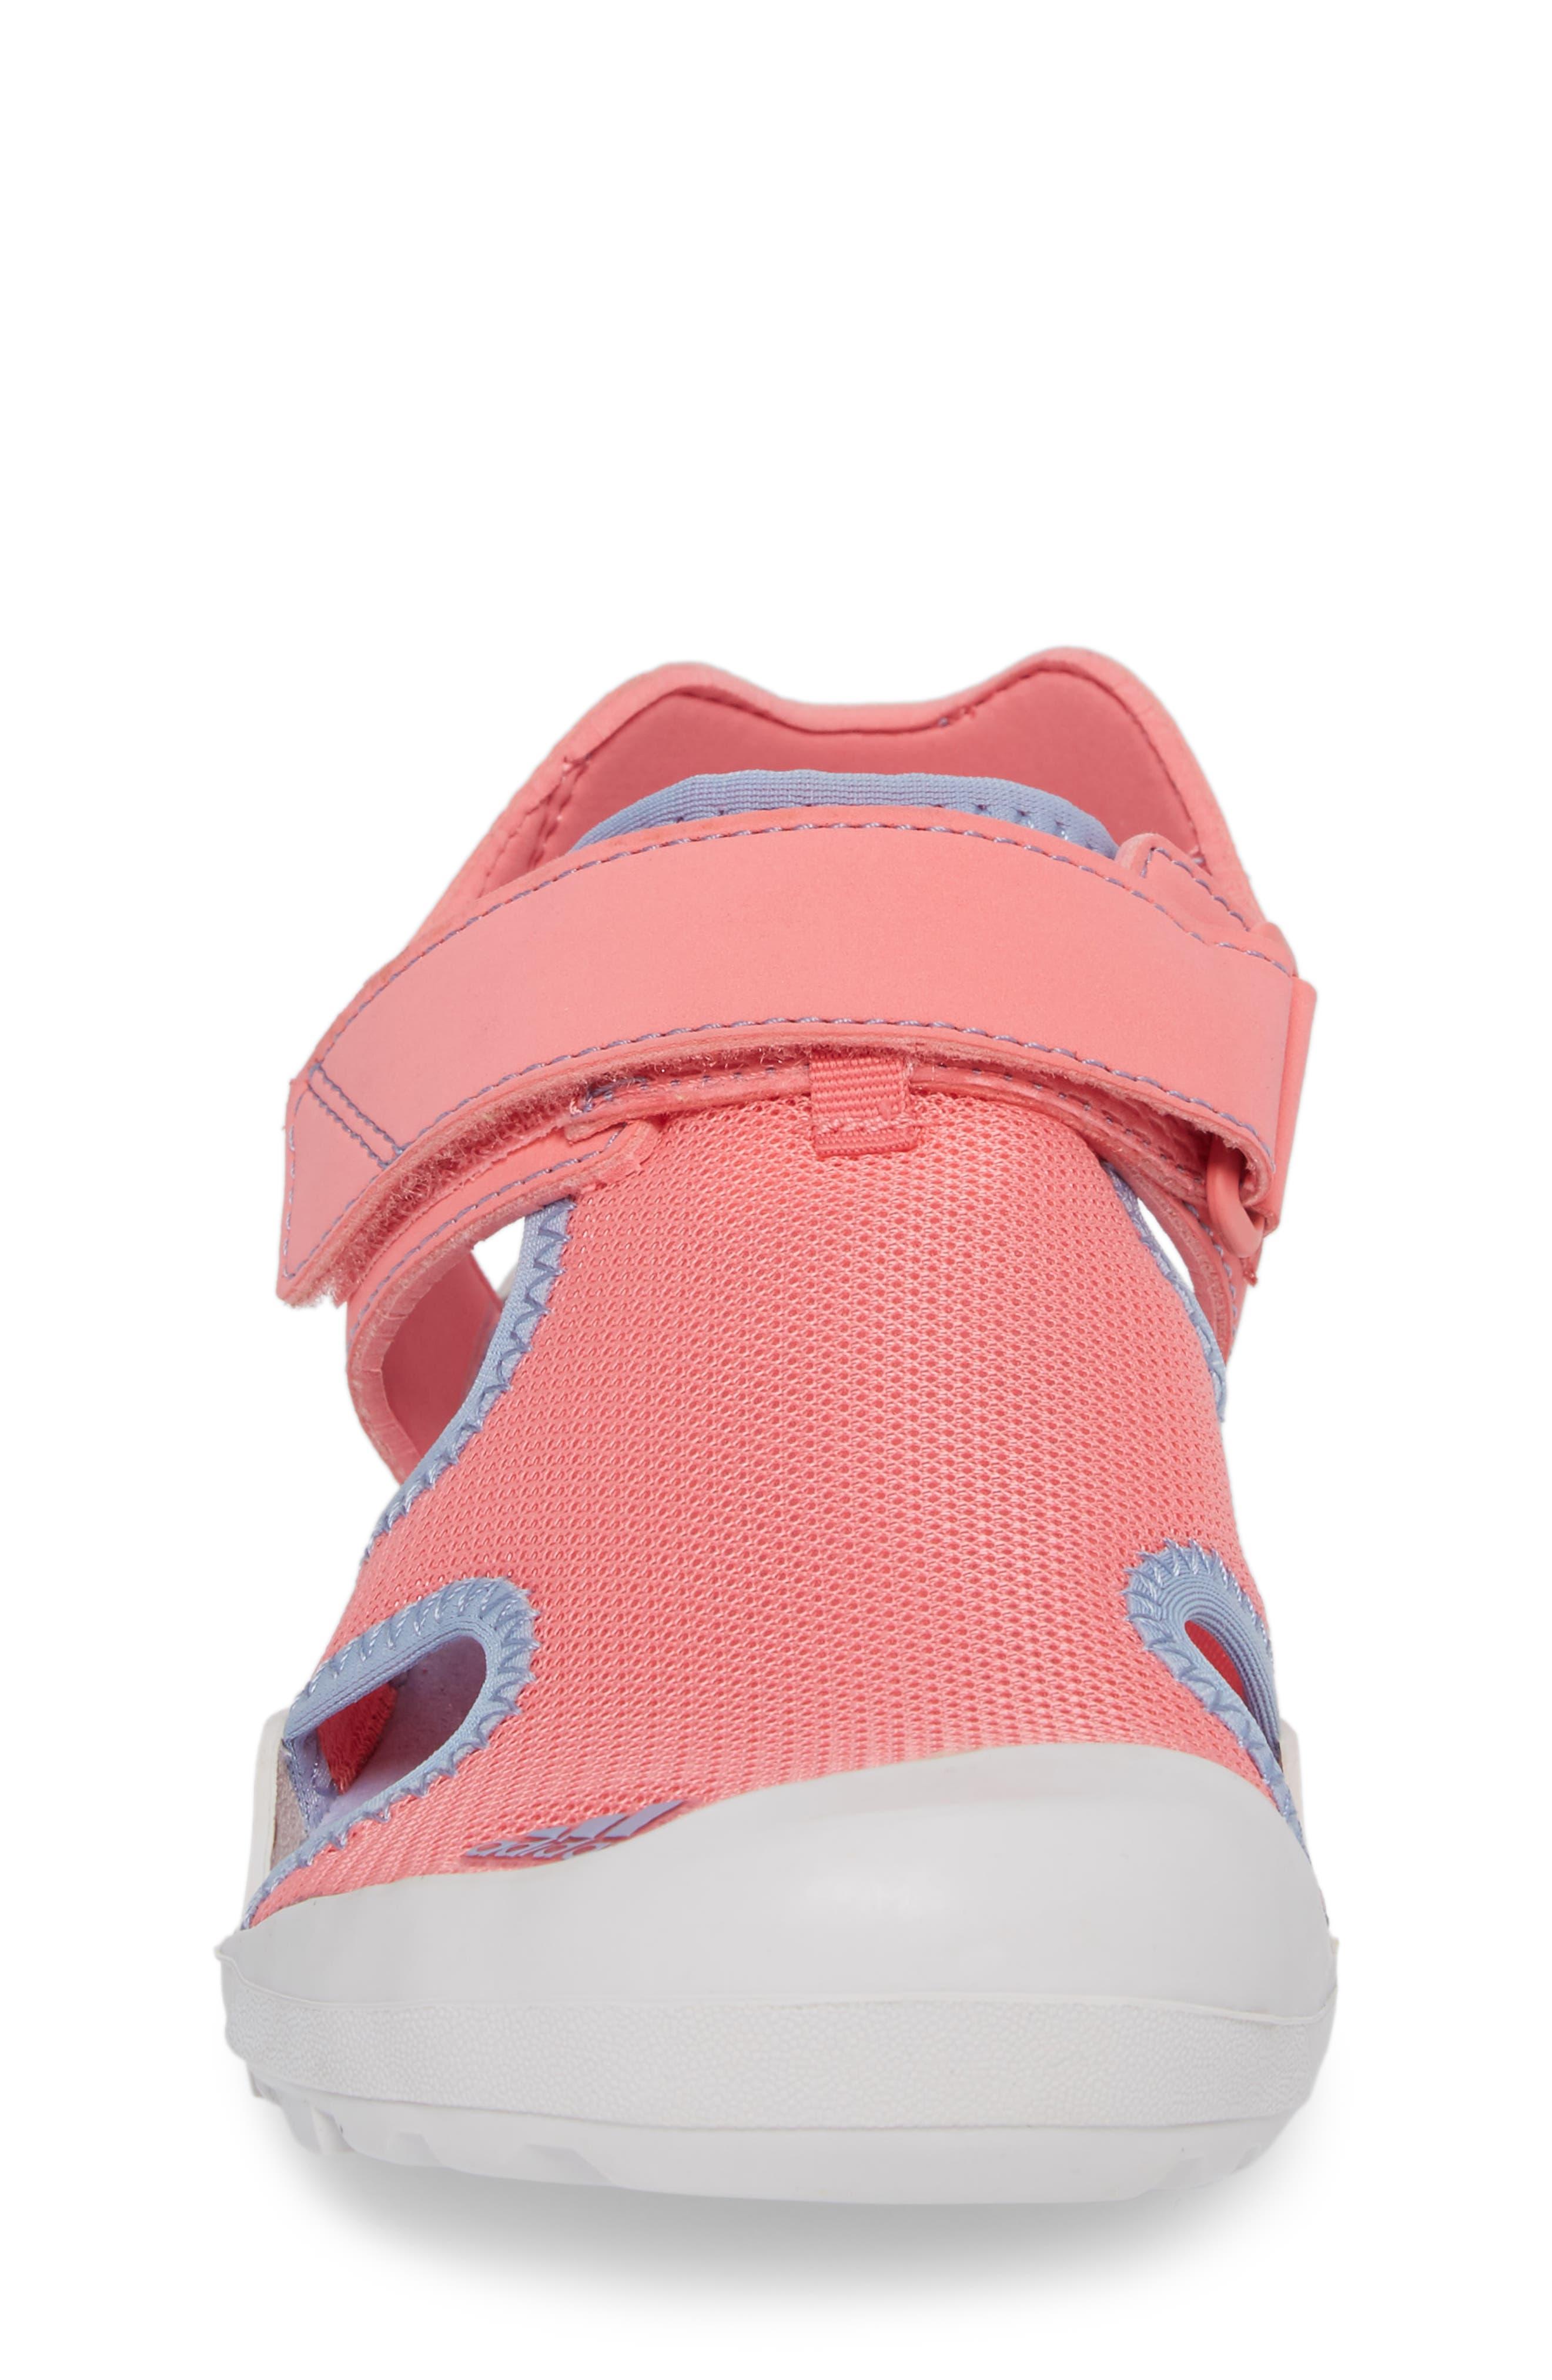 'Captain Toey' Sandal,                             Alternate thumbnail 4, color,                             Chalk Pink/ Chalk Blue/ Grey